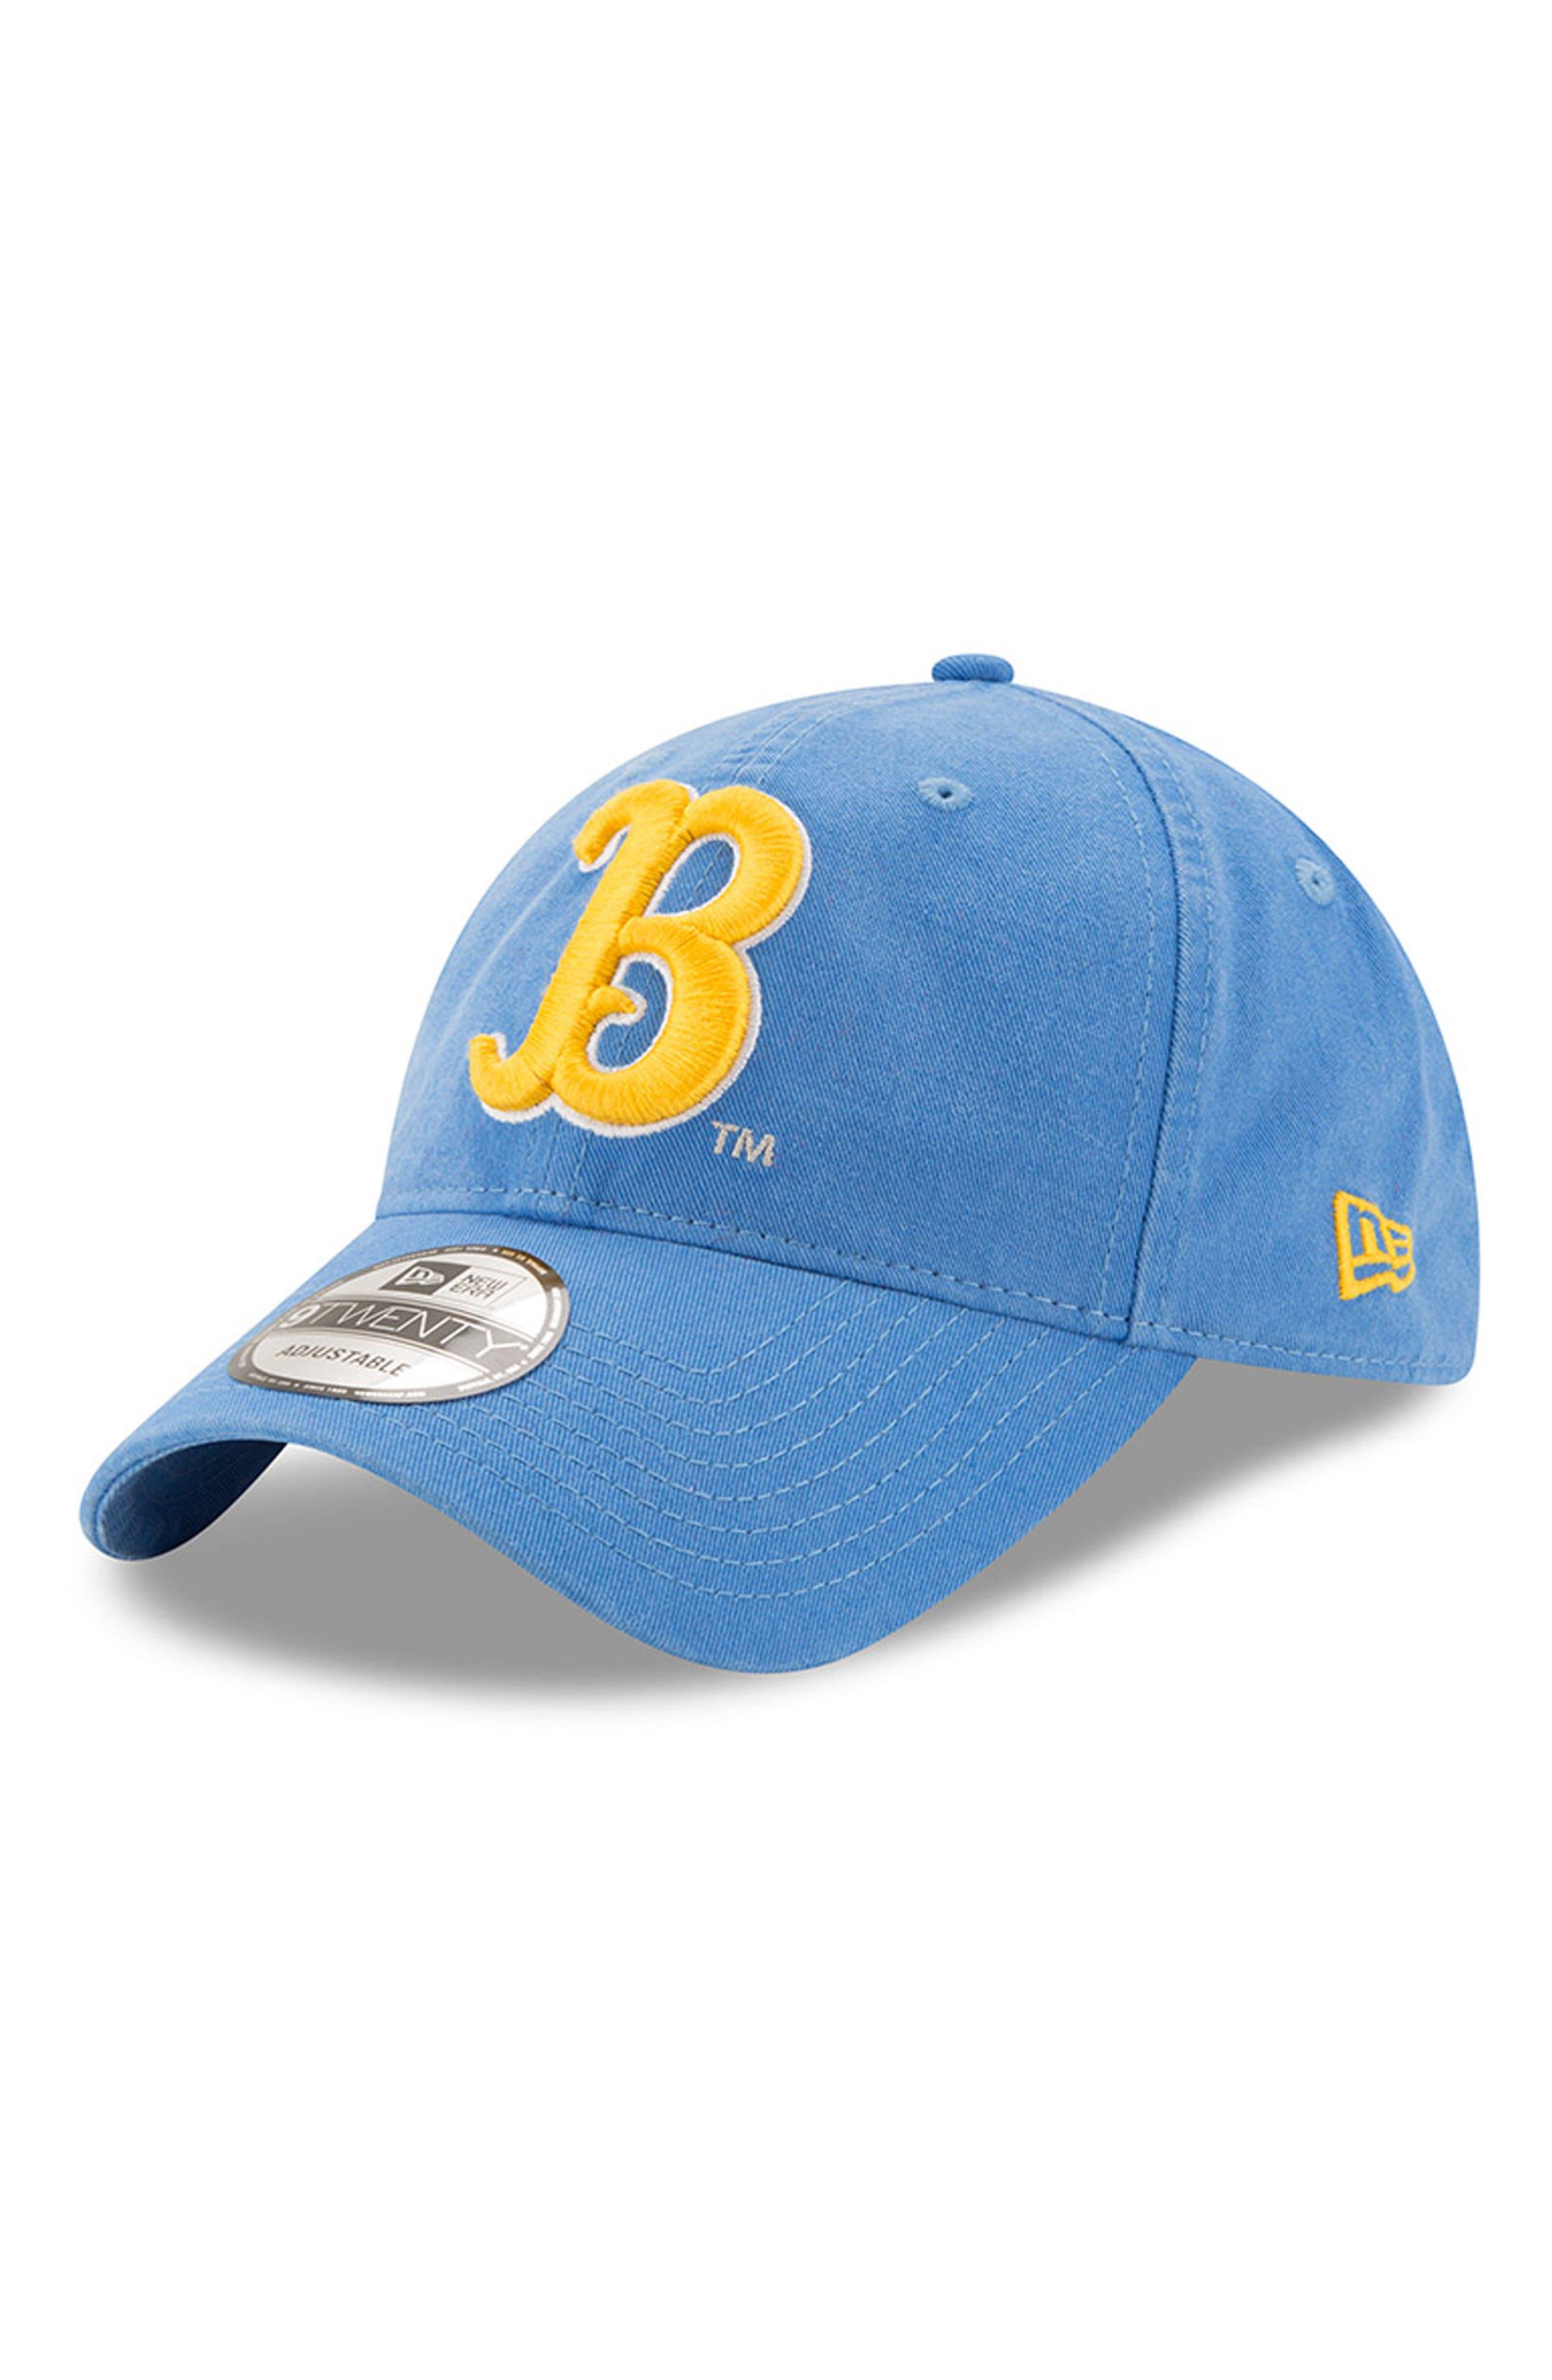 New Era Collegiate Core Classic - UCLA Bruins Baseball Cap,                         Main,                         color, 420